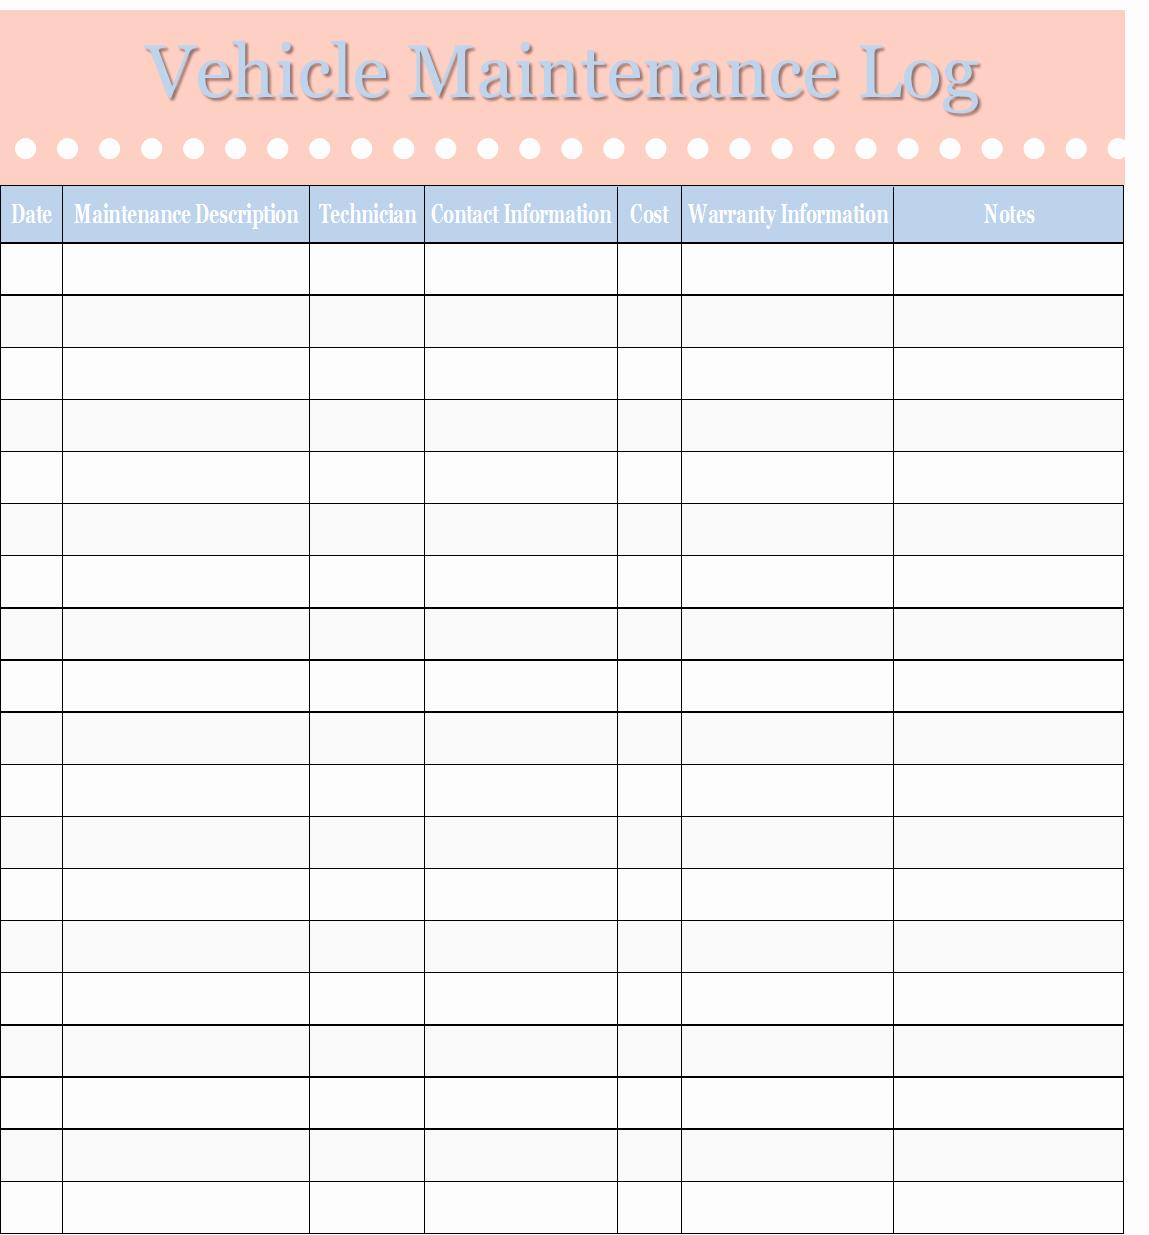 Truck Maintenance Log Template Elegant Template Vehicle Maintenance Log